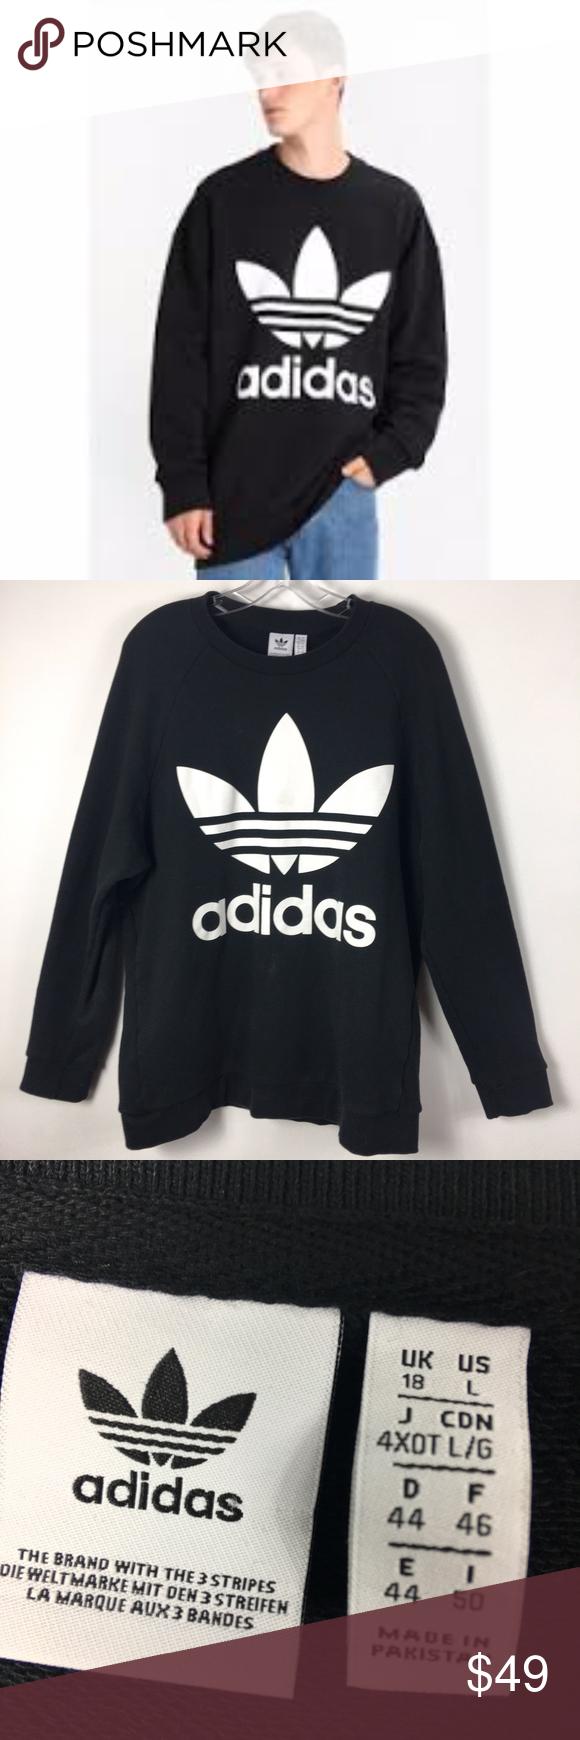 Adidas Original Trefoil Crewneck Sweatshirt Black Black Sweatshirts Crew Neck Sweatshirt Sweatshirt Shirt [ 1740 x 580 Pixel ]